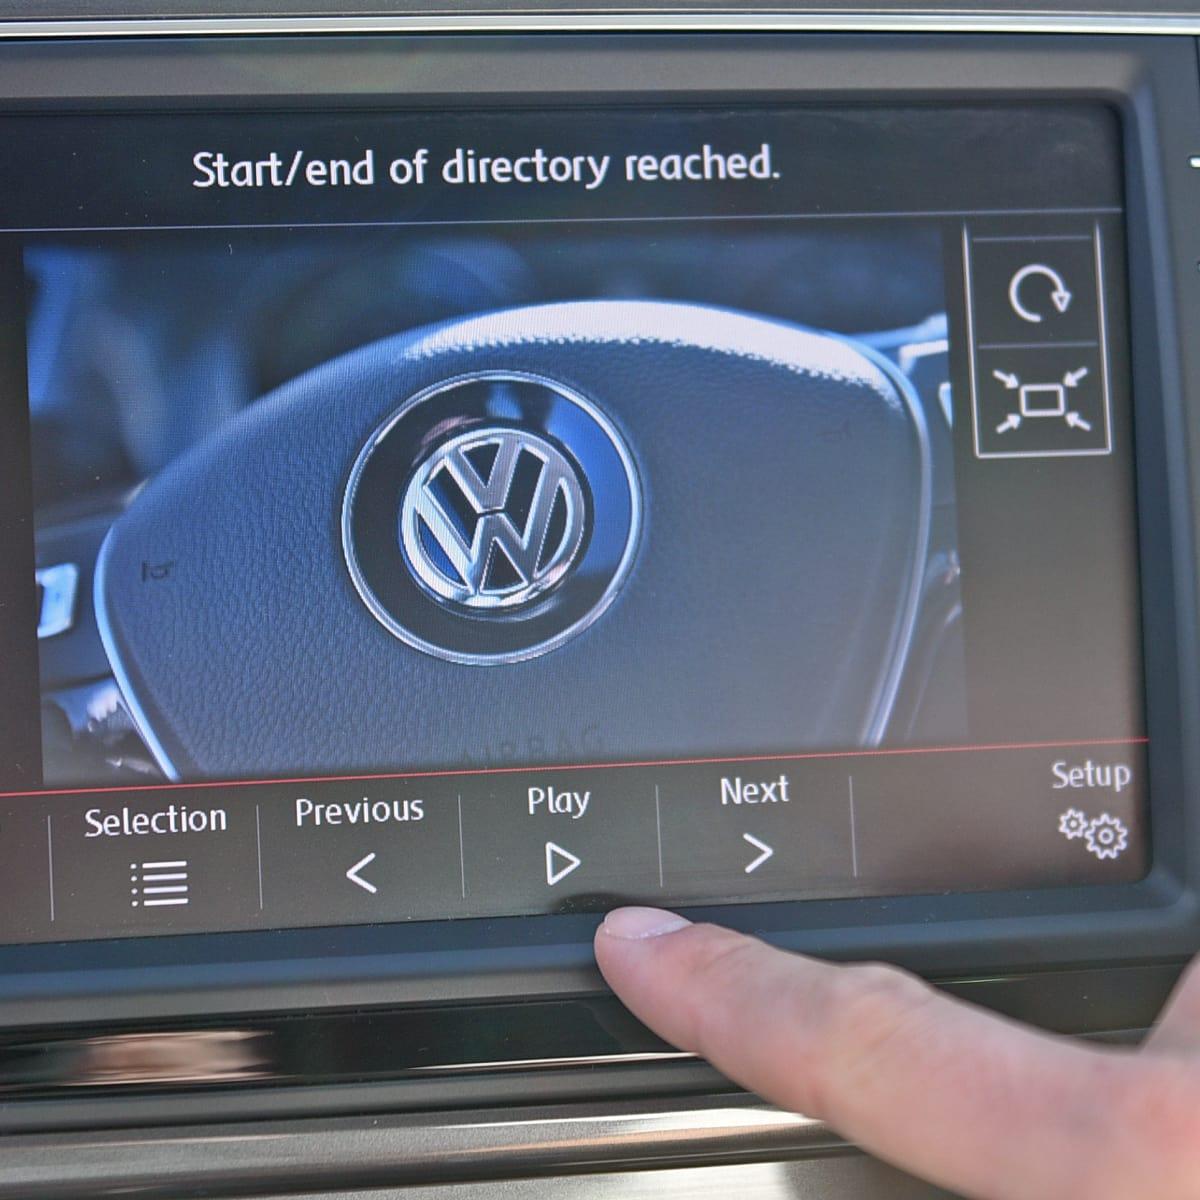 Volkswagen MIB II Infotainment System - Reviewed